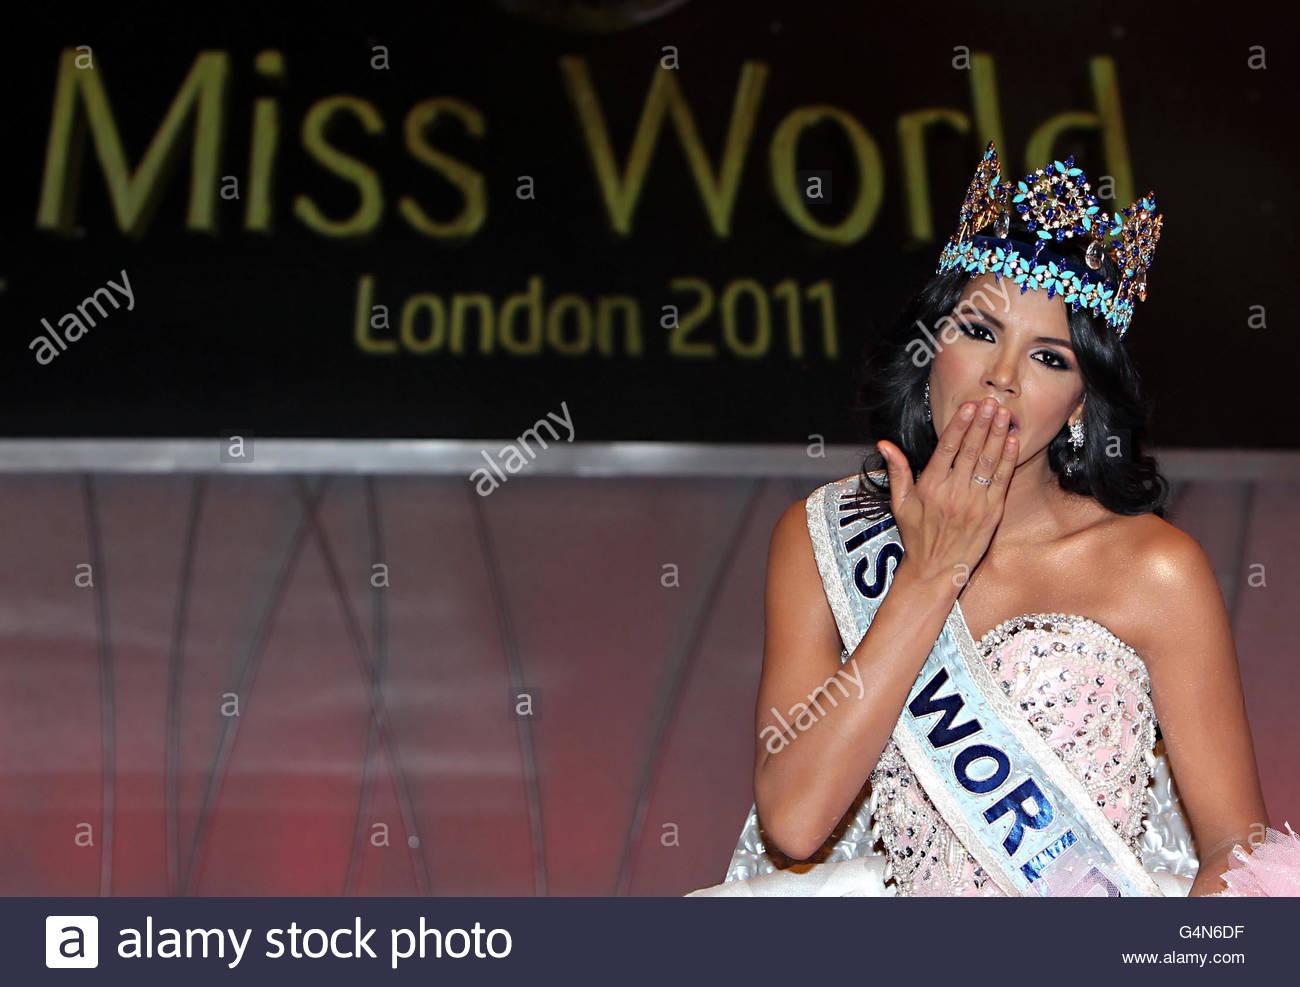 ivian sarcos, miss world 2011.  - Página 4 Miss-w17